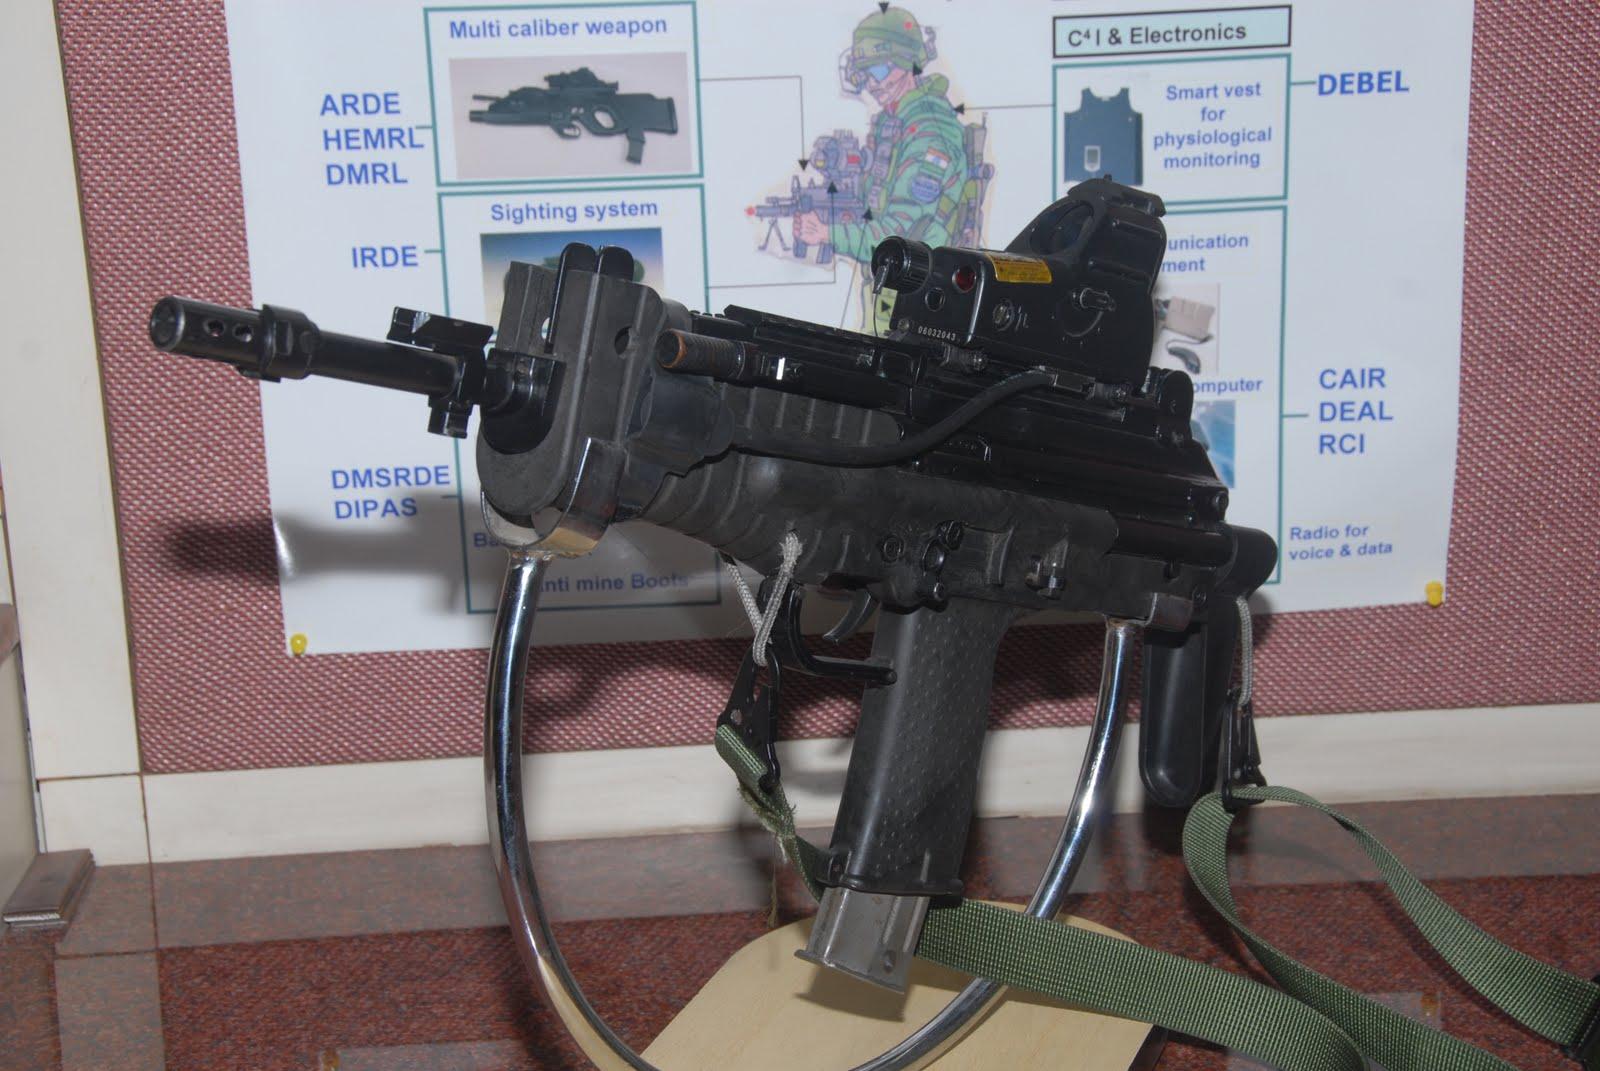 Caution India Drdos New Light Machine Gun